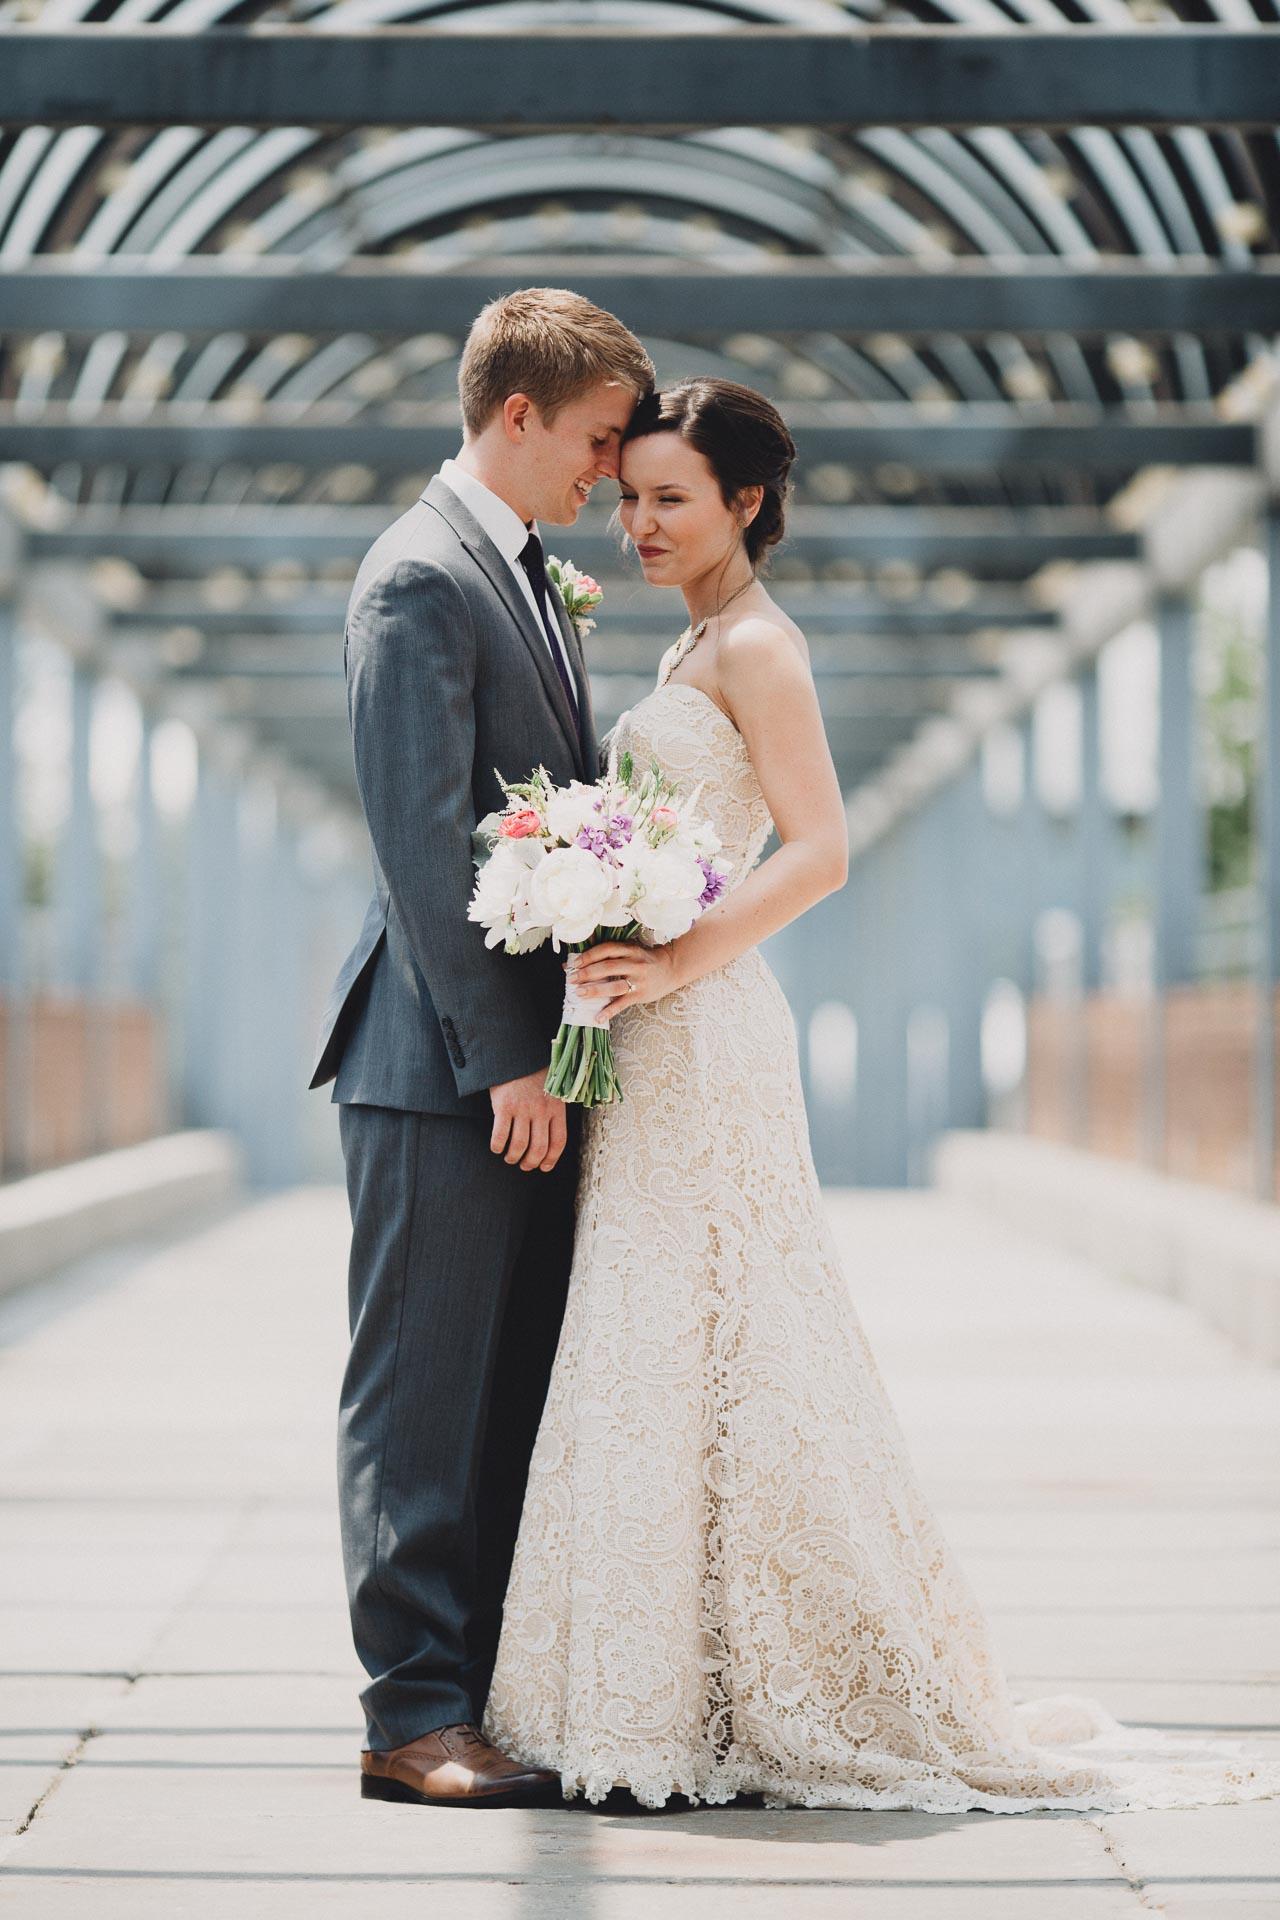 Julia-Michael-Cincinnati-Music-Hall-Wedding-058@2x.jpg